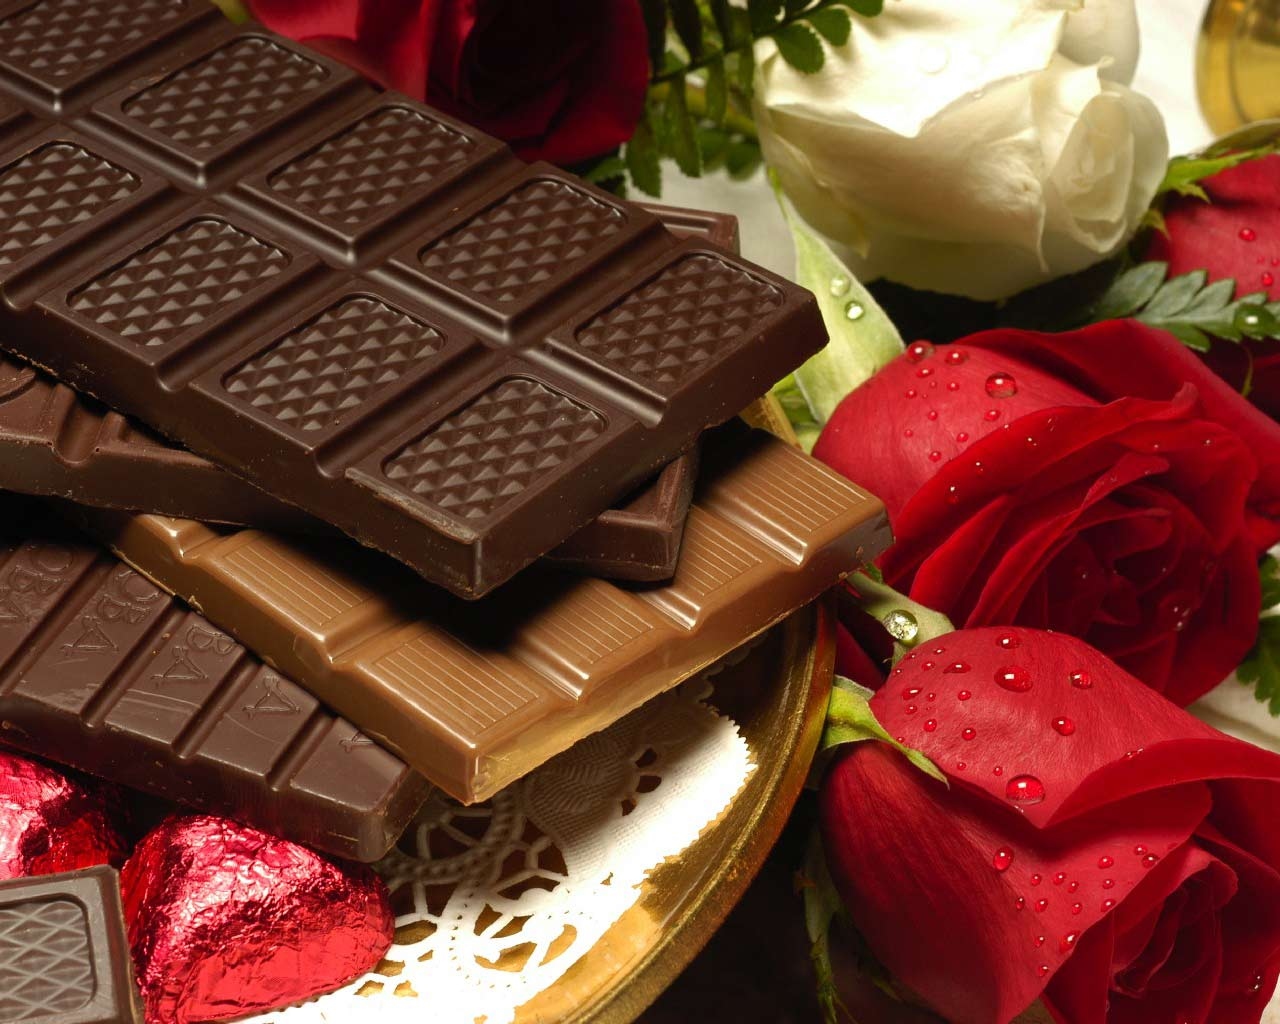 http://4.bp.blogspot.com/_KnMYa8zwDzg/TCmhcLtUEKI/AAAAAAAAALE/tWlo0x9Mhj8/s1600/Sweet-Heart-Chocolate-Wallpaper.jpg